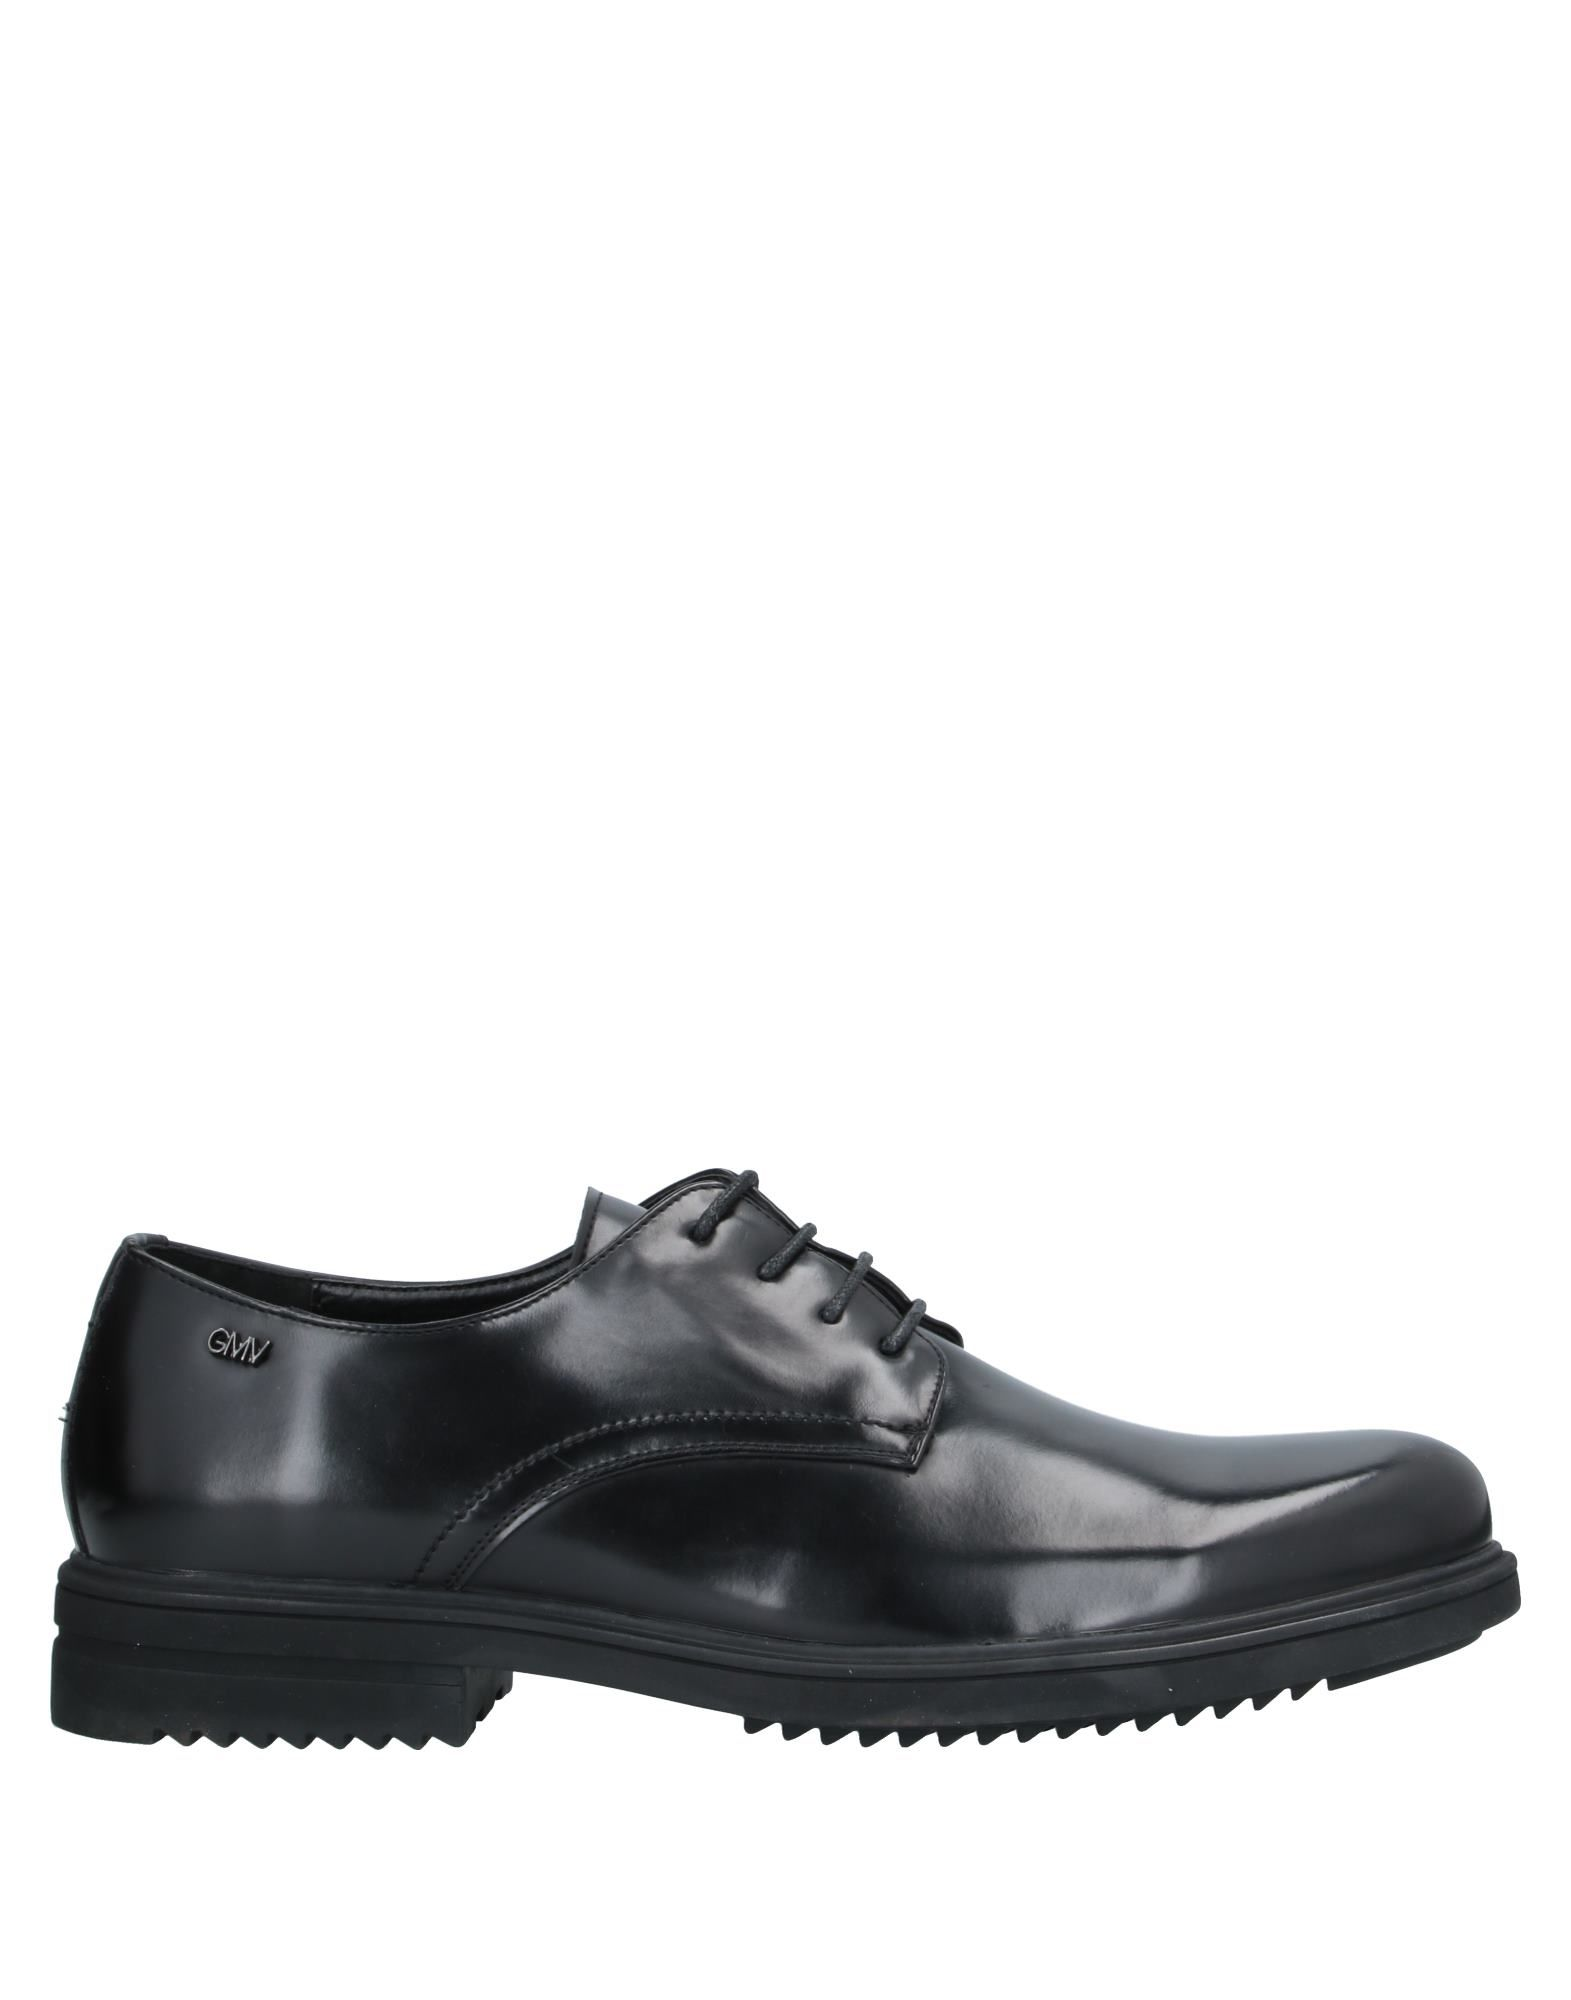 GIANMARCO VENTURI Обувь на шнурках цены онлайн